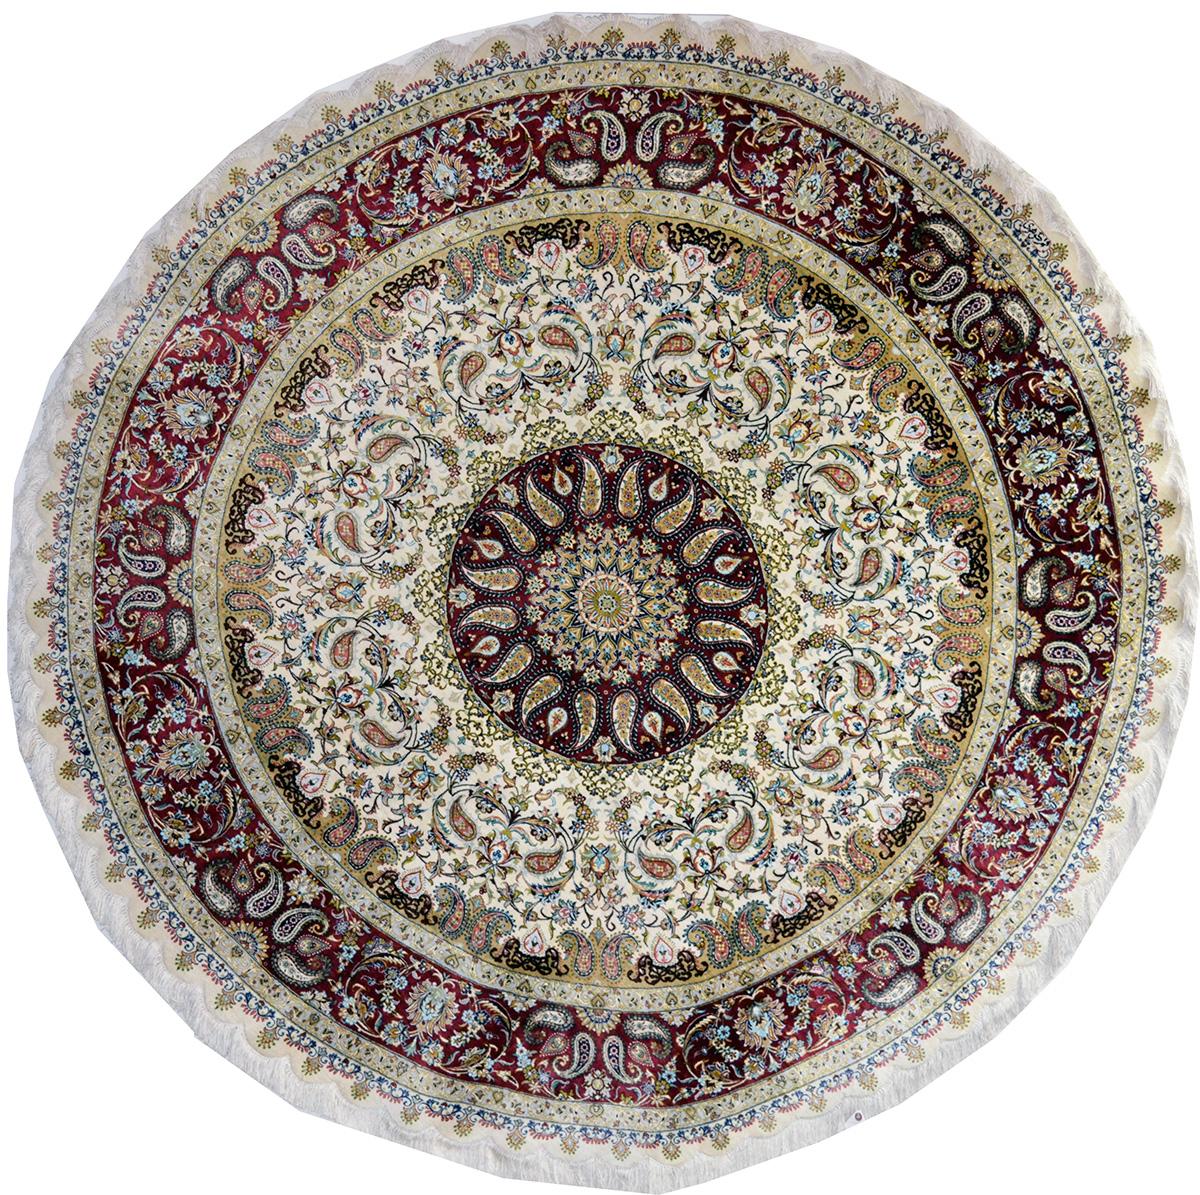 Qum Silk Circular Persian Area Rug 200x200